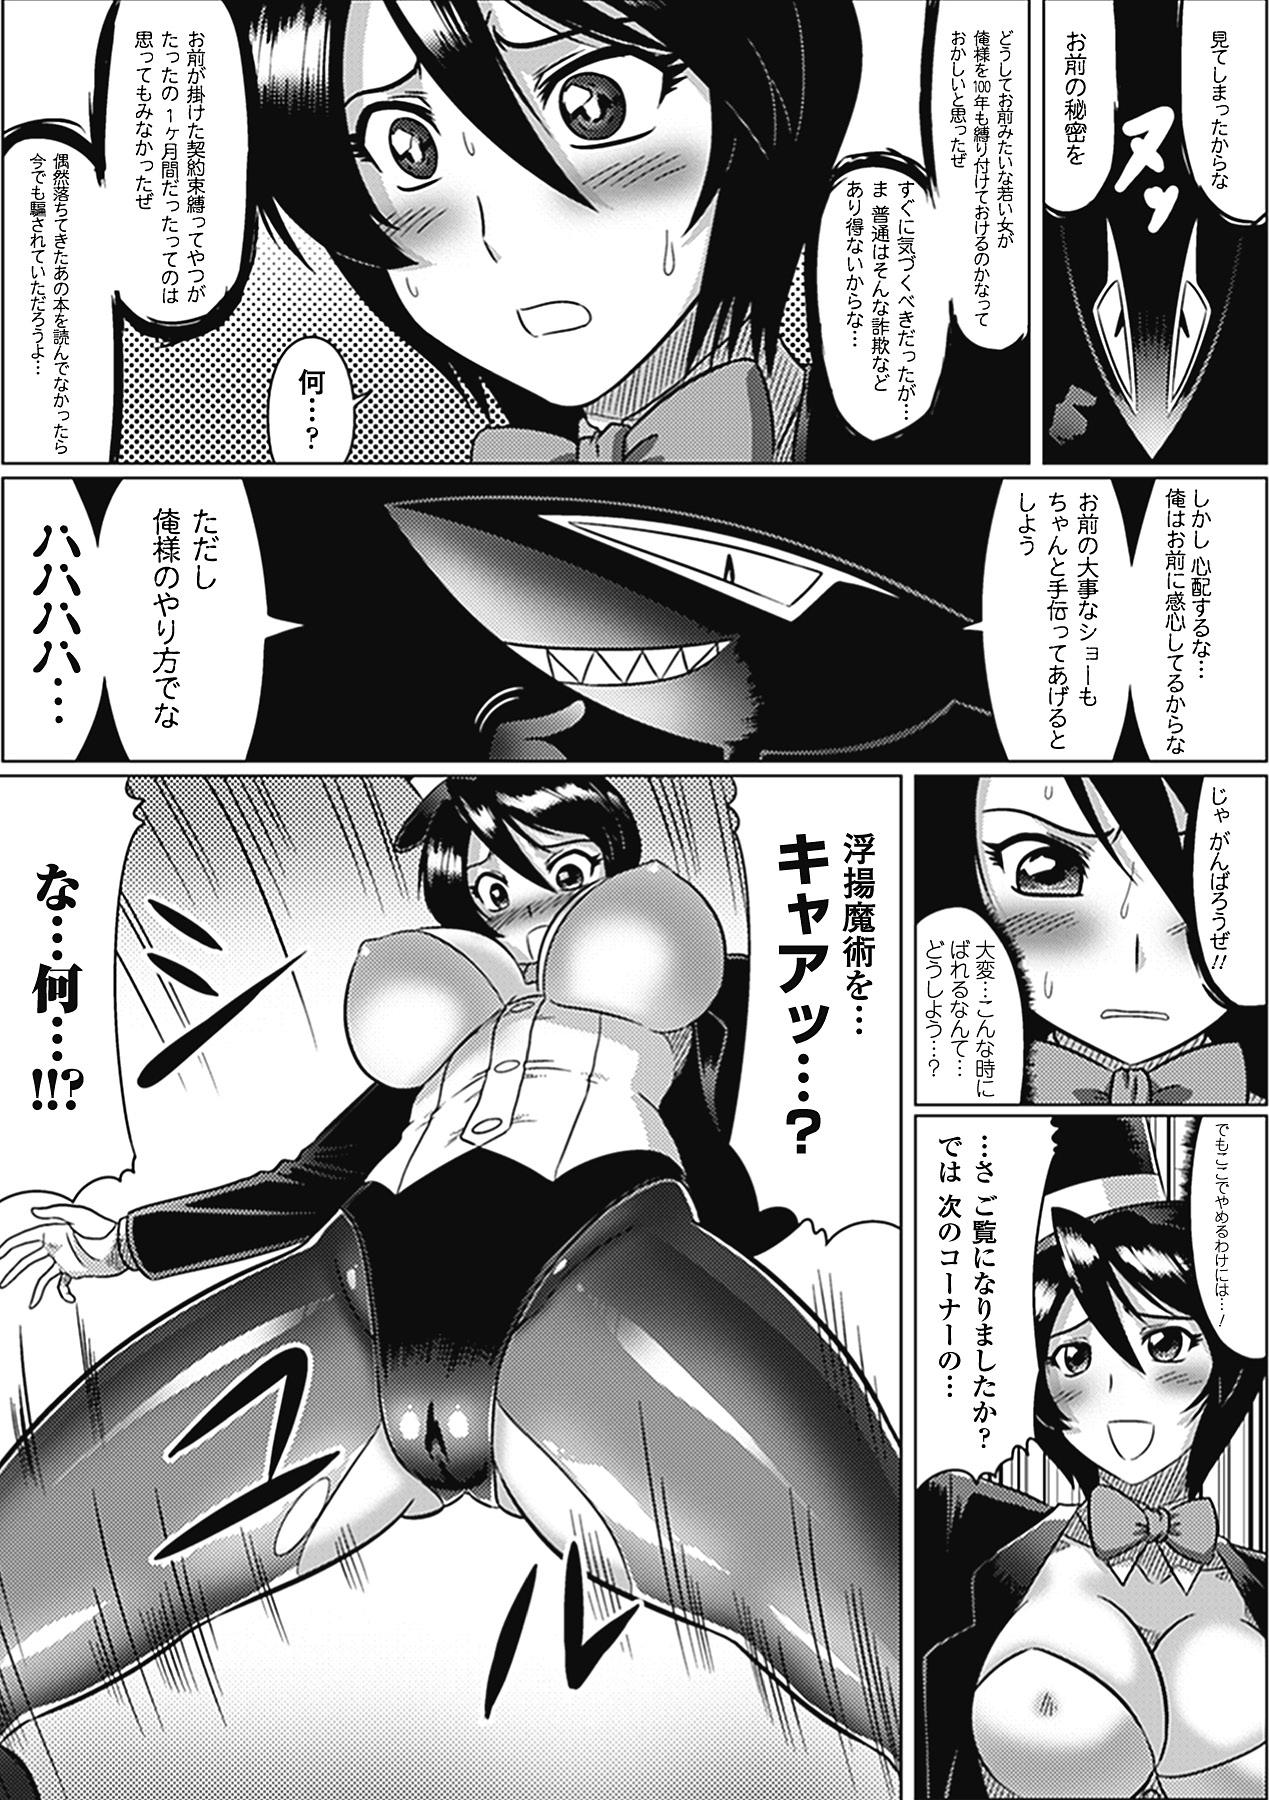 Megami Crisis 1 147